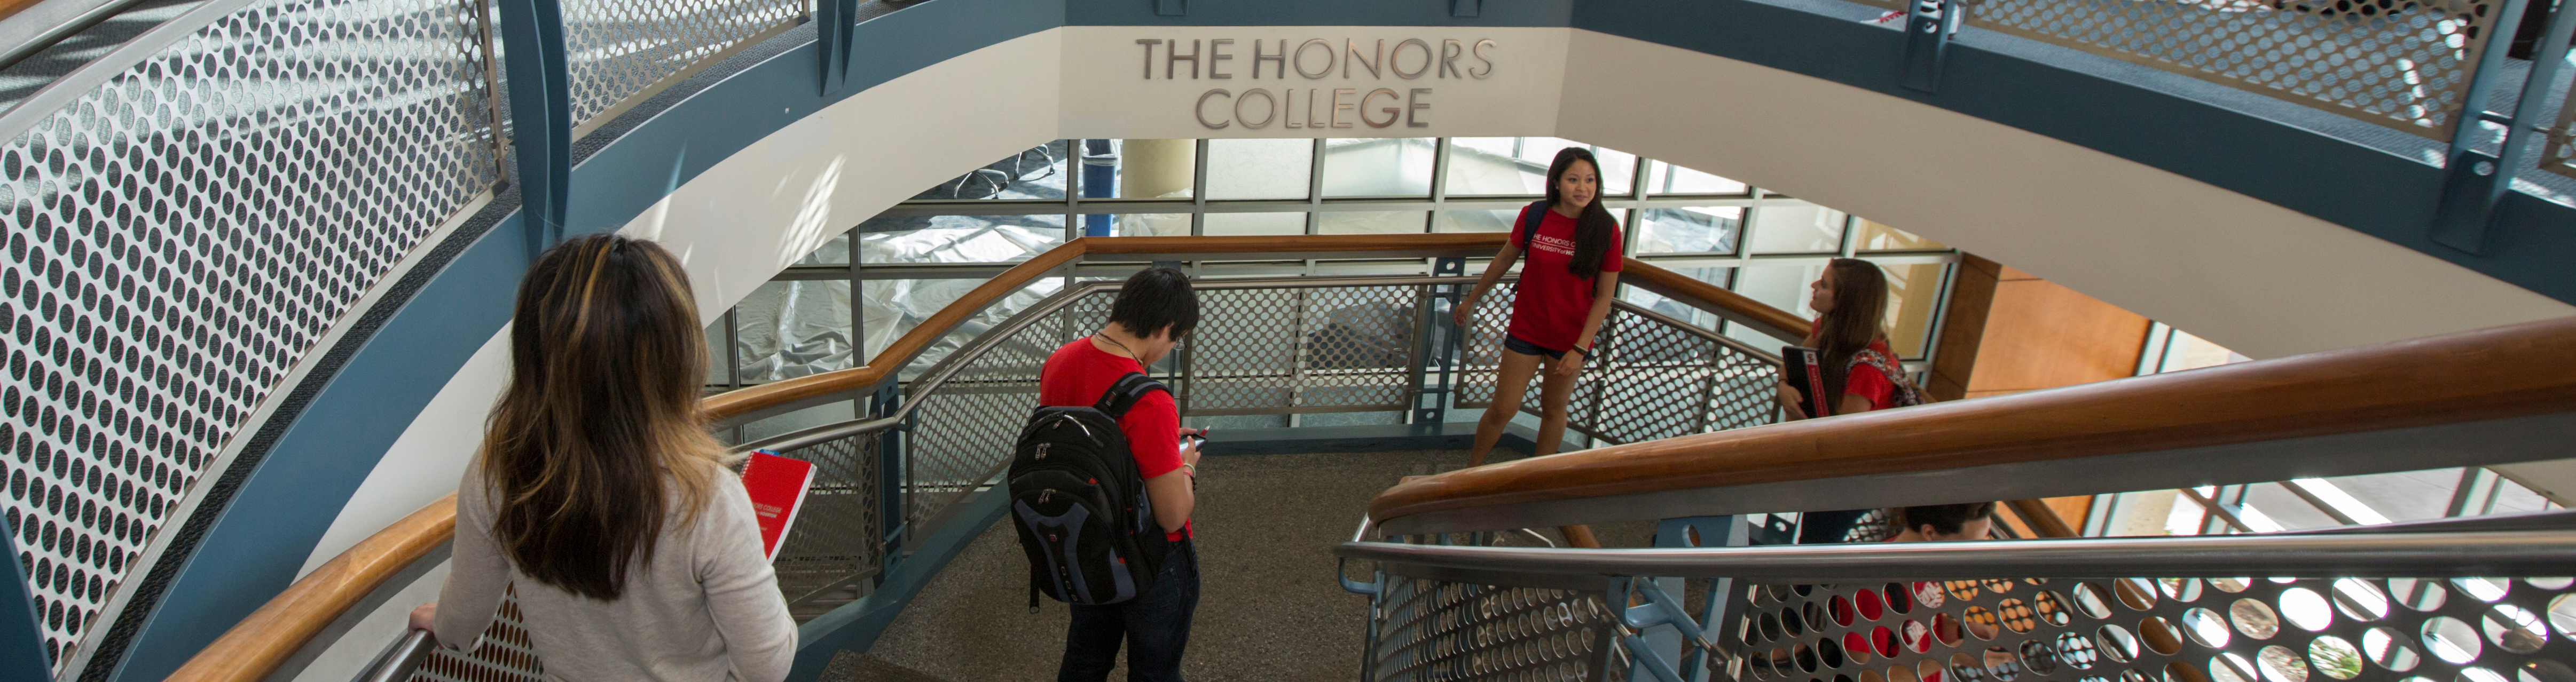 010 University Of Arizona Honors College Essay Prompt Studentbanner10 Stunning Full